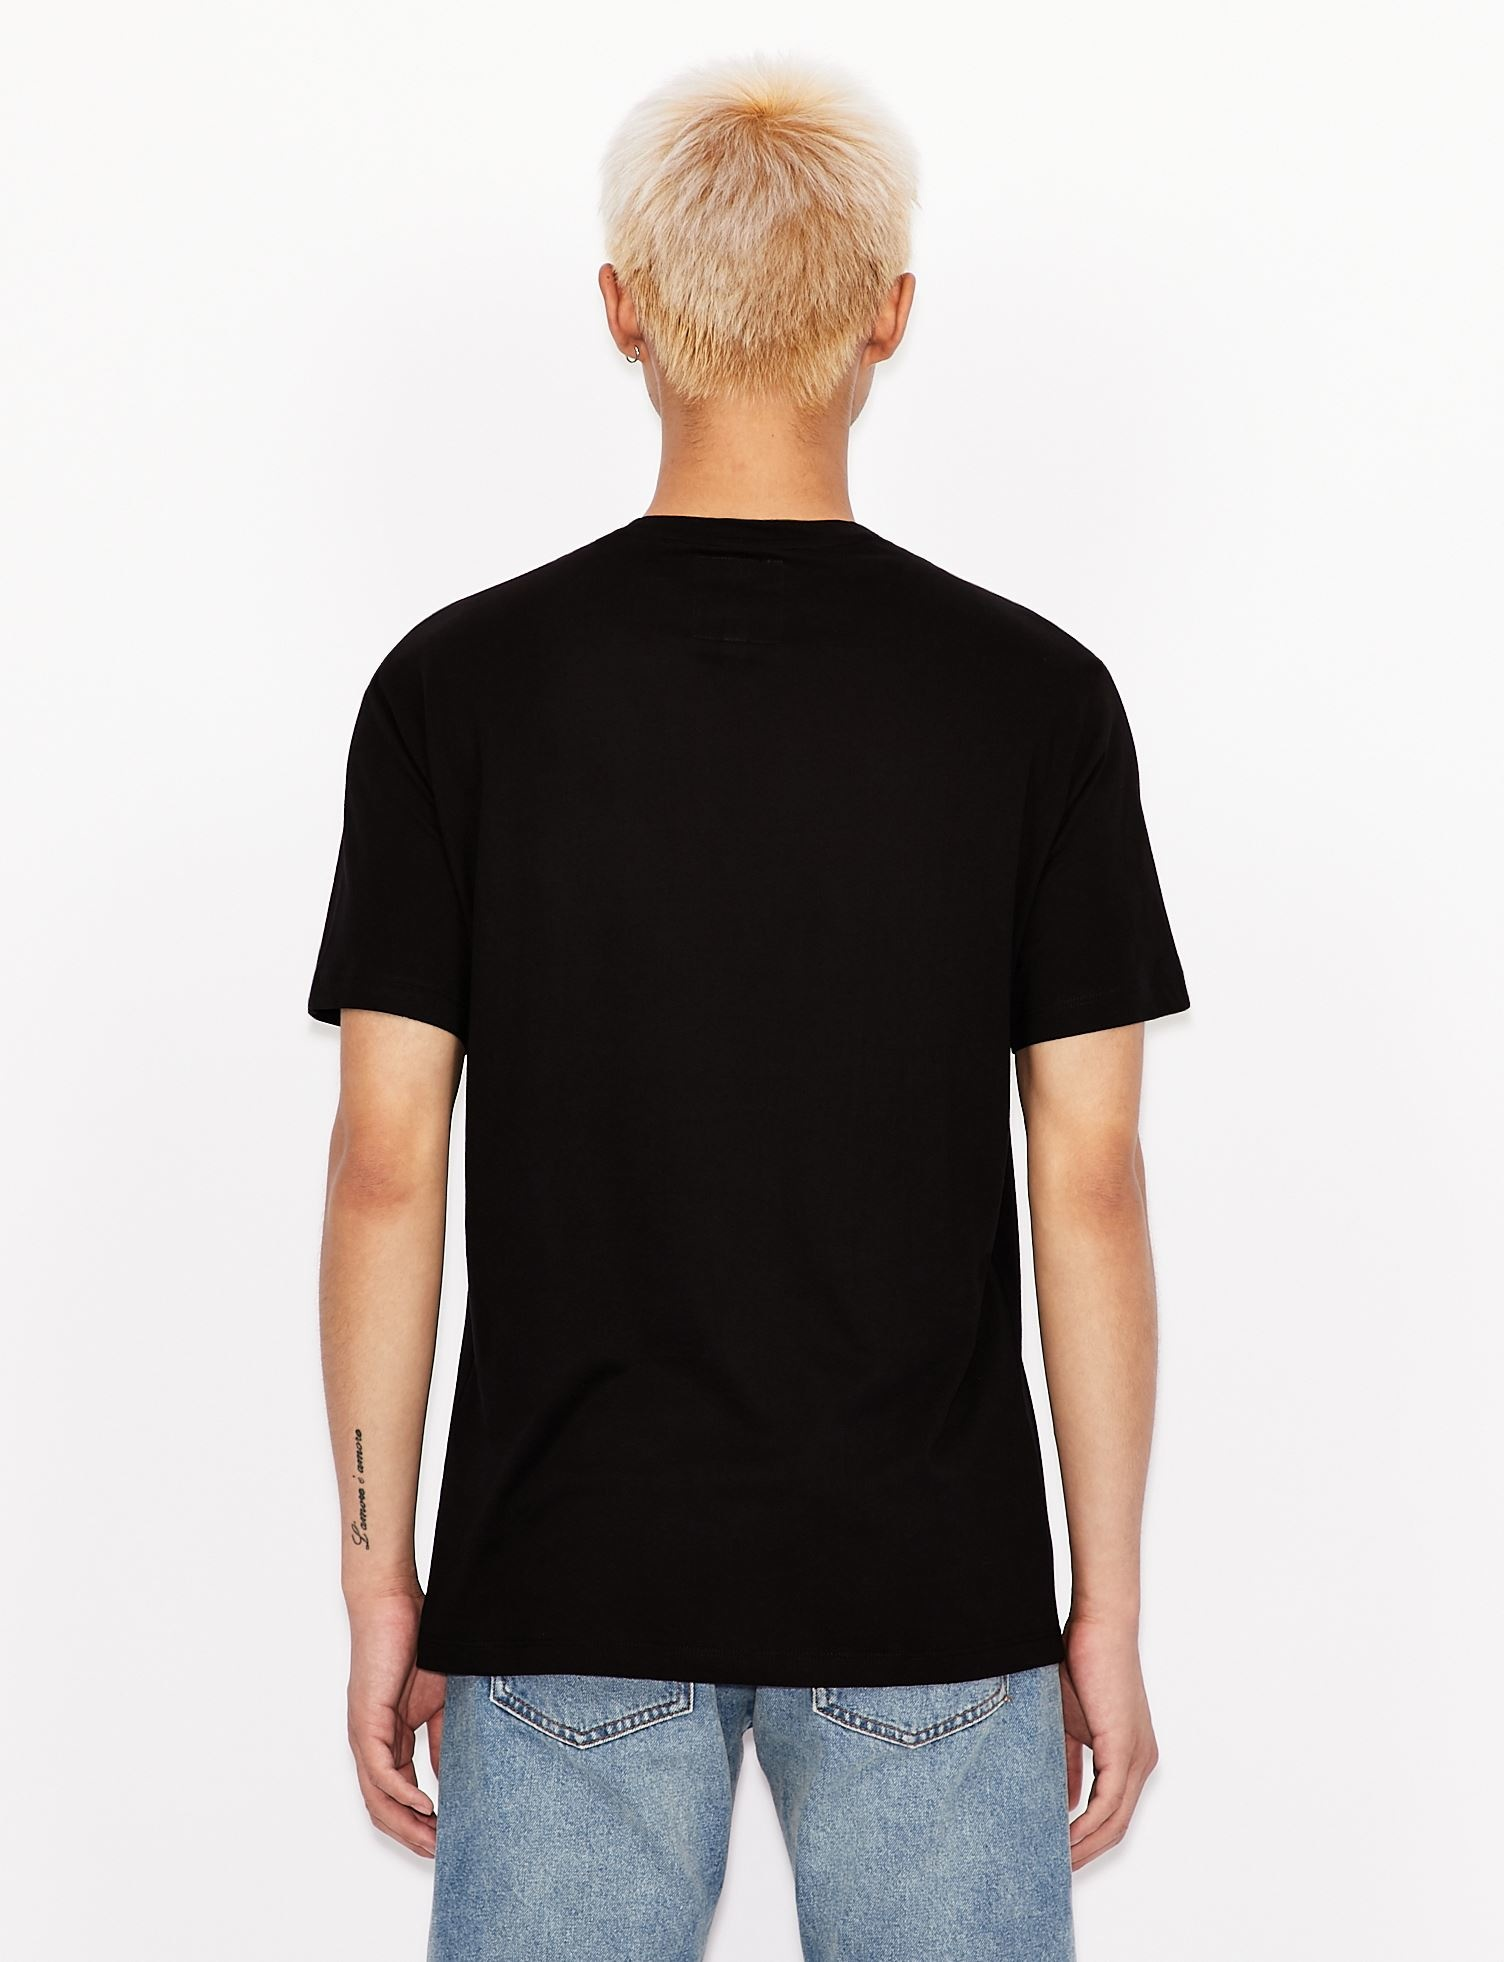 Armani Exchange T-shirt Armani Exchange 8NZTPA-ZJH4Z-1200